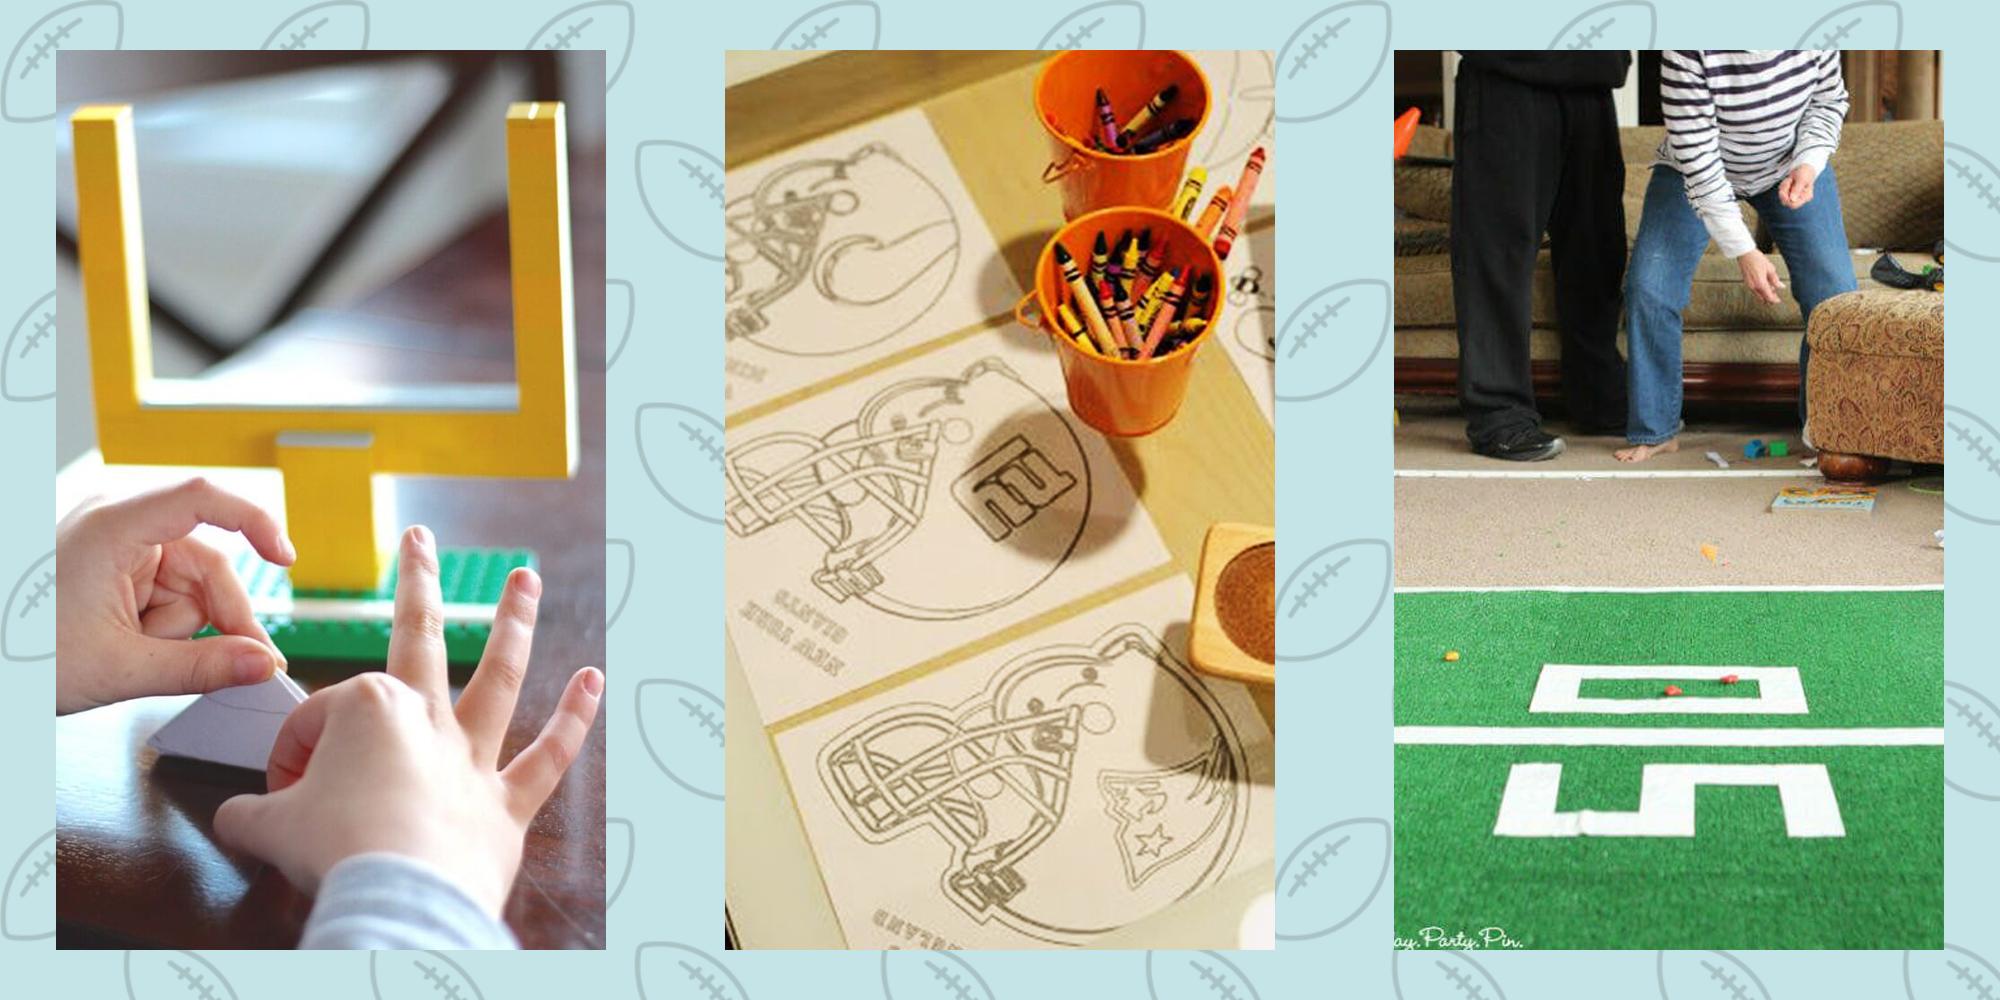 photo about Bowl Pick Em Printable Sheet titled 15 Simplest Tremendous Bowl Social gathering Video games - Enjoyment Routines for Tremendous